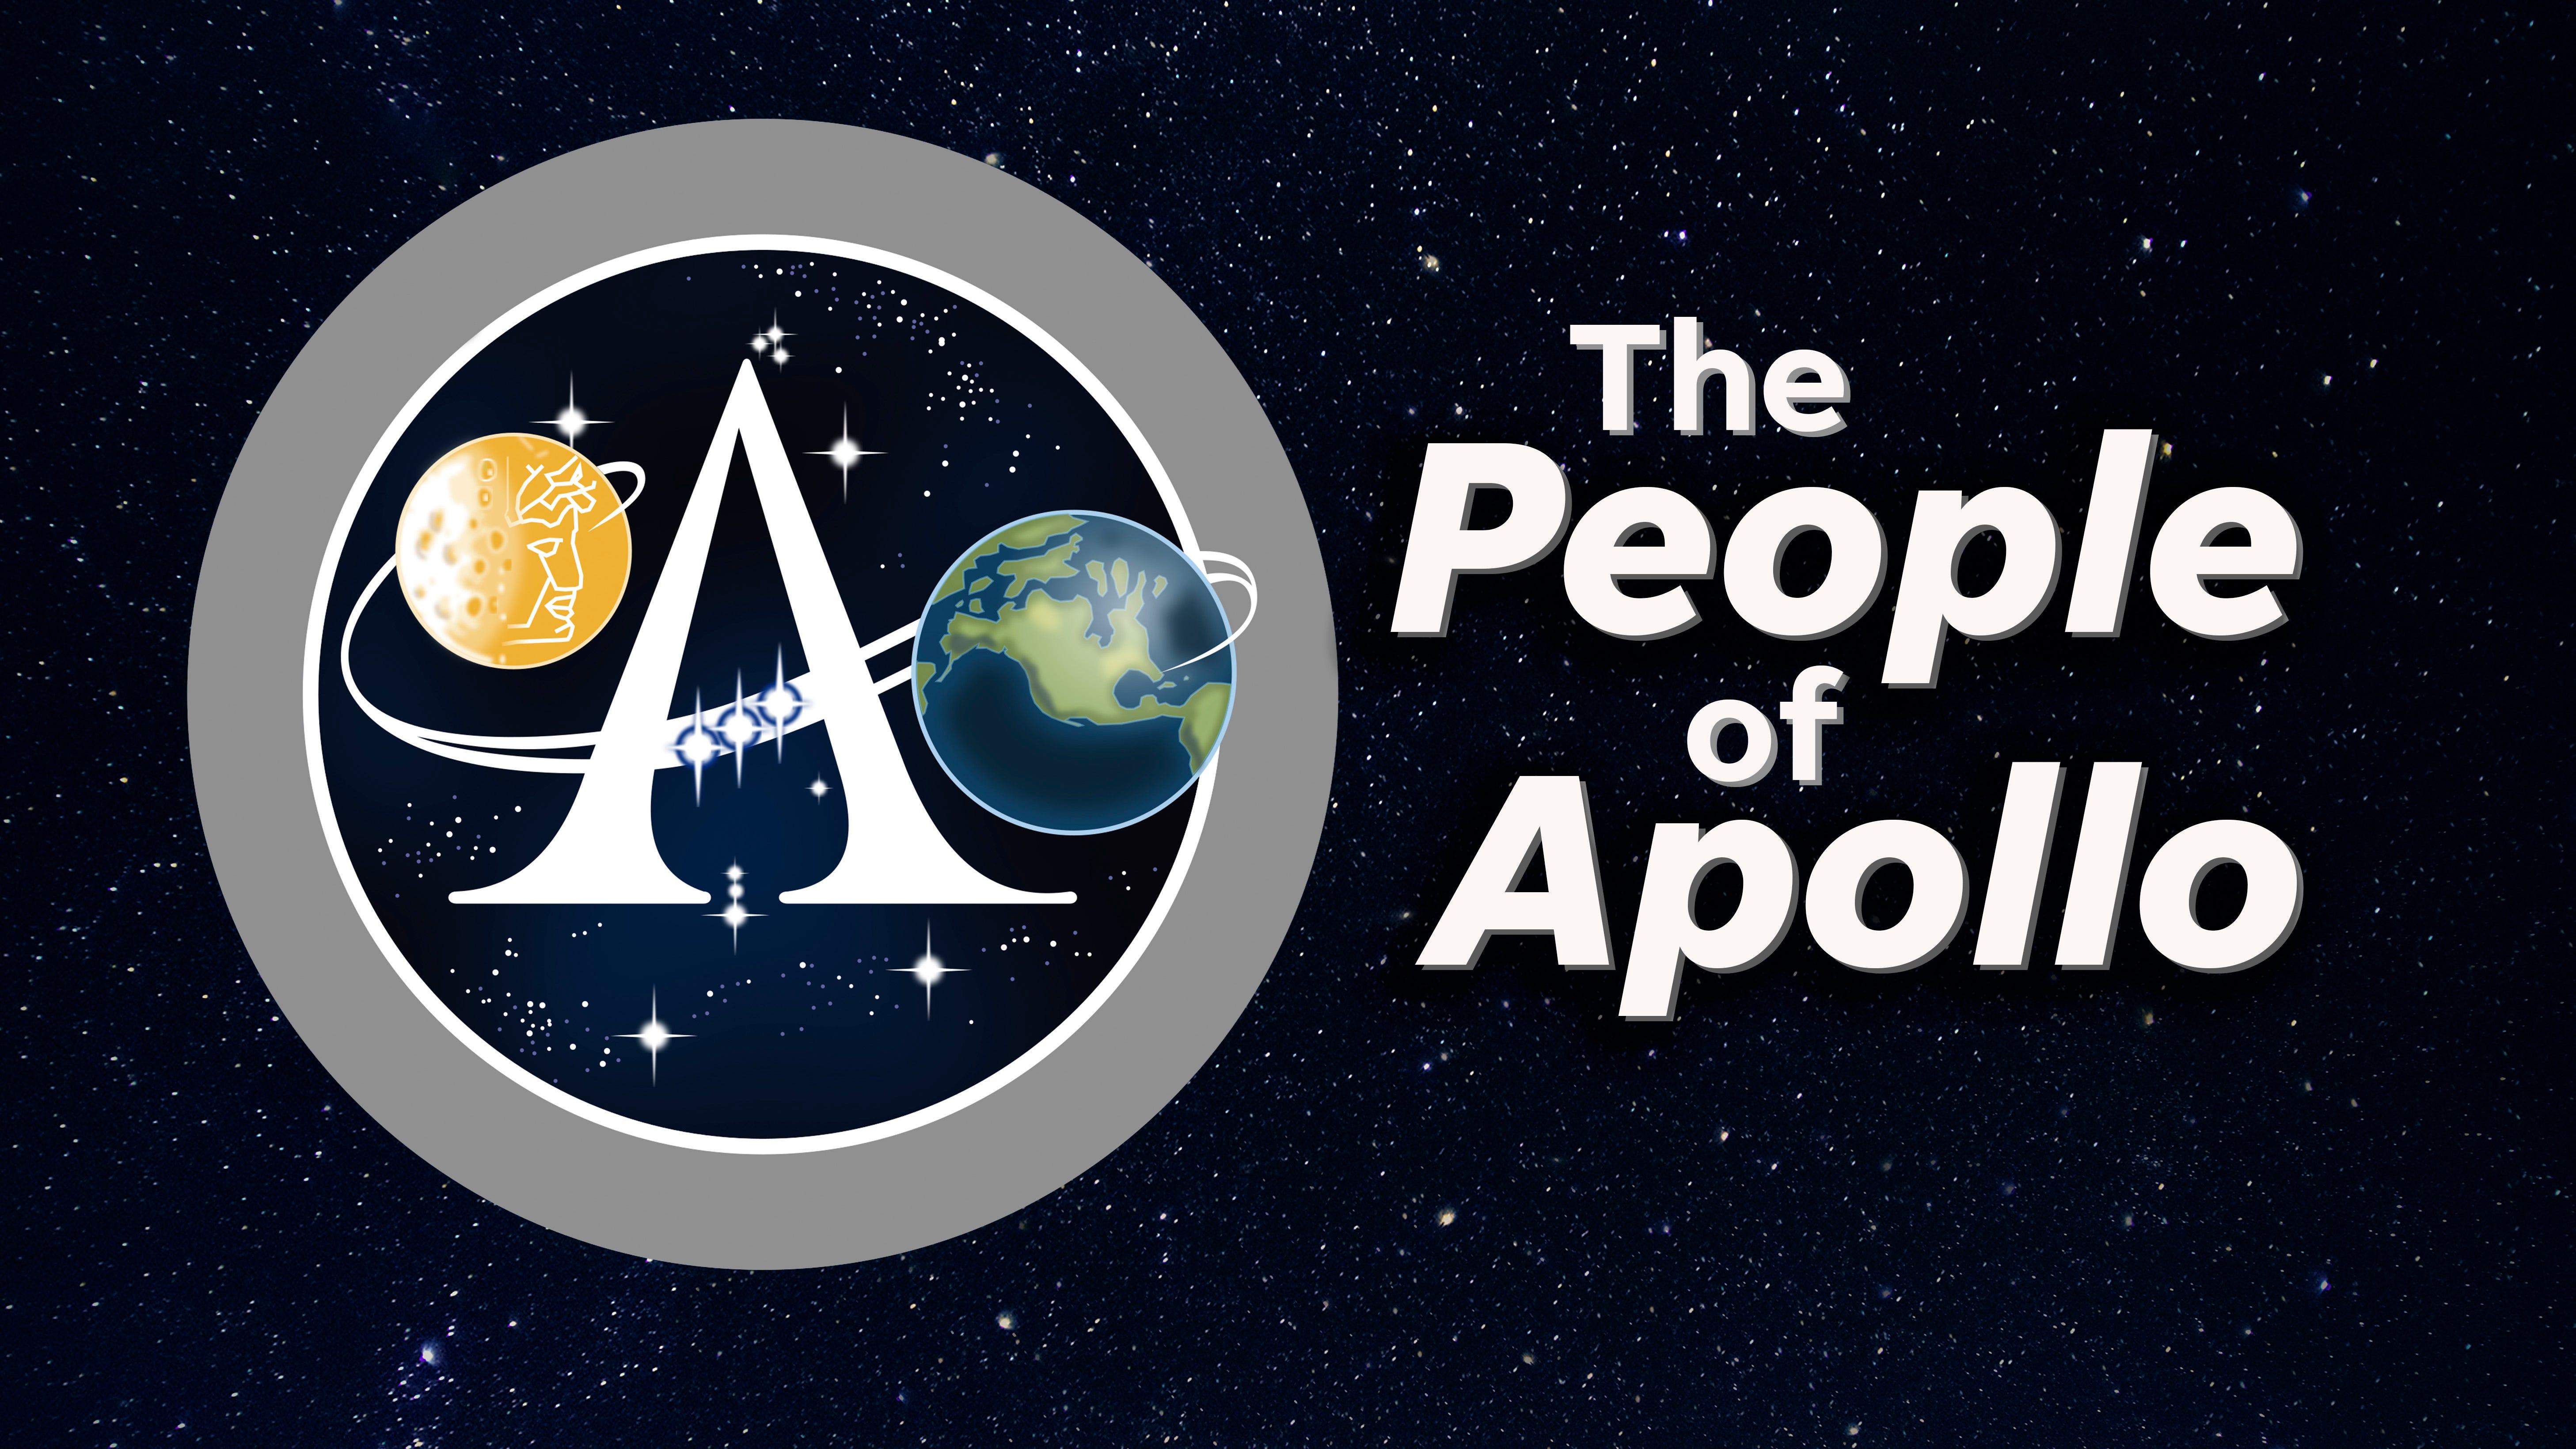 'People of Apollo' moon landing documentary trailer